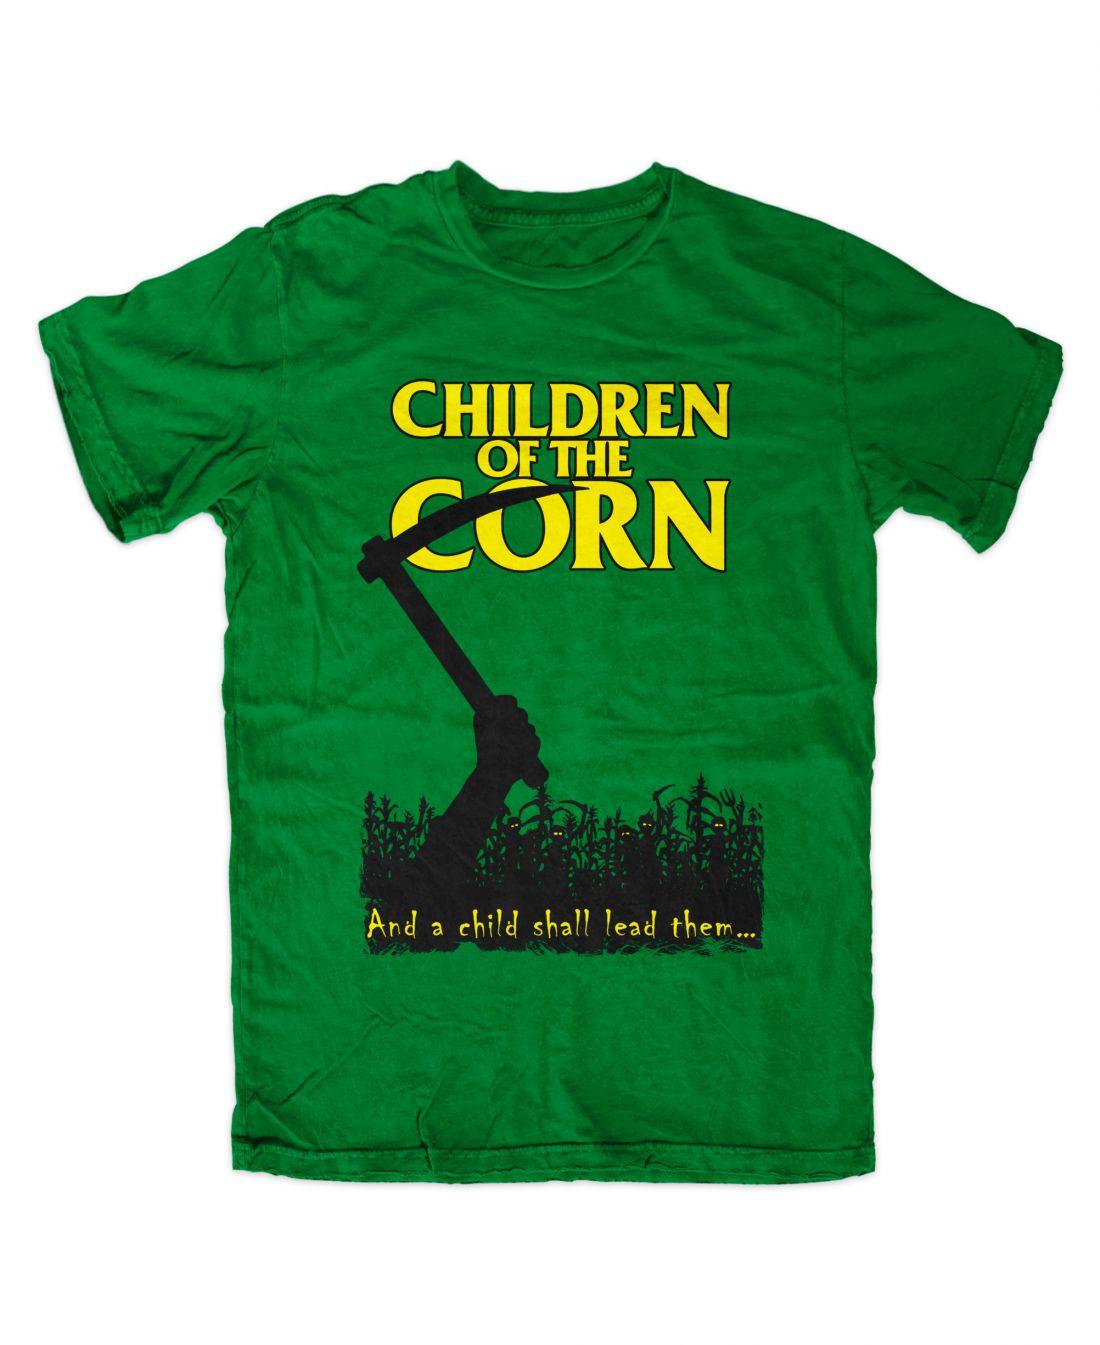 Children Of The Corn  (irish green póló)